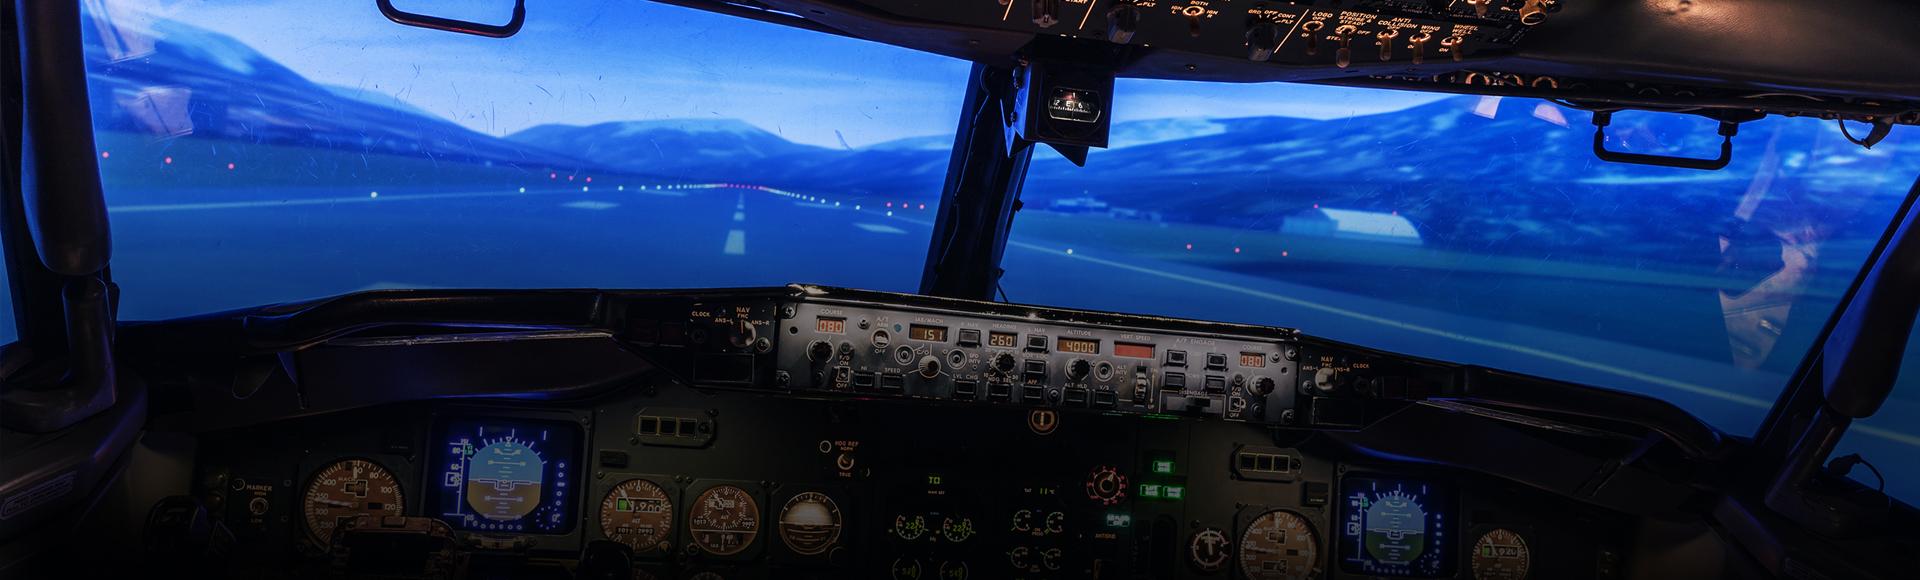 Slider Flugzeug